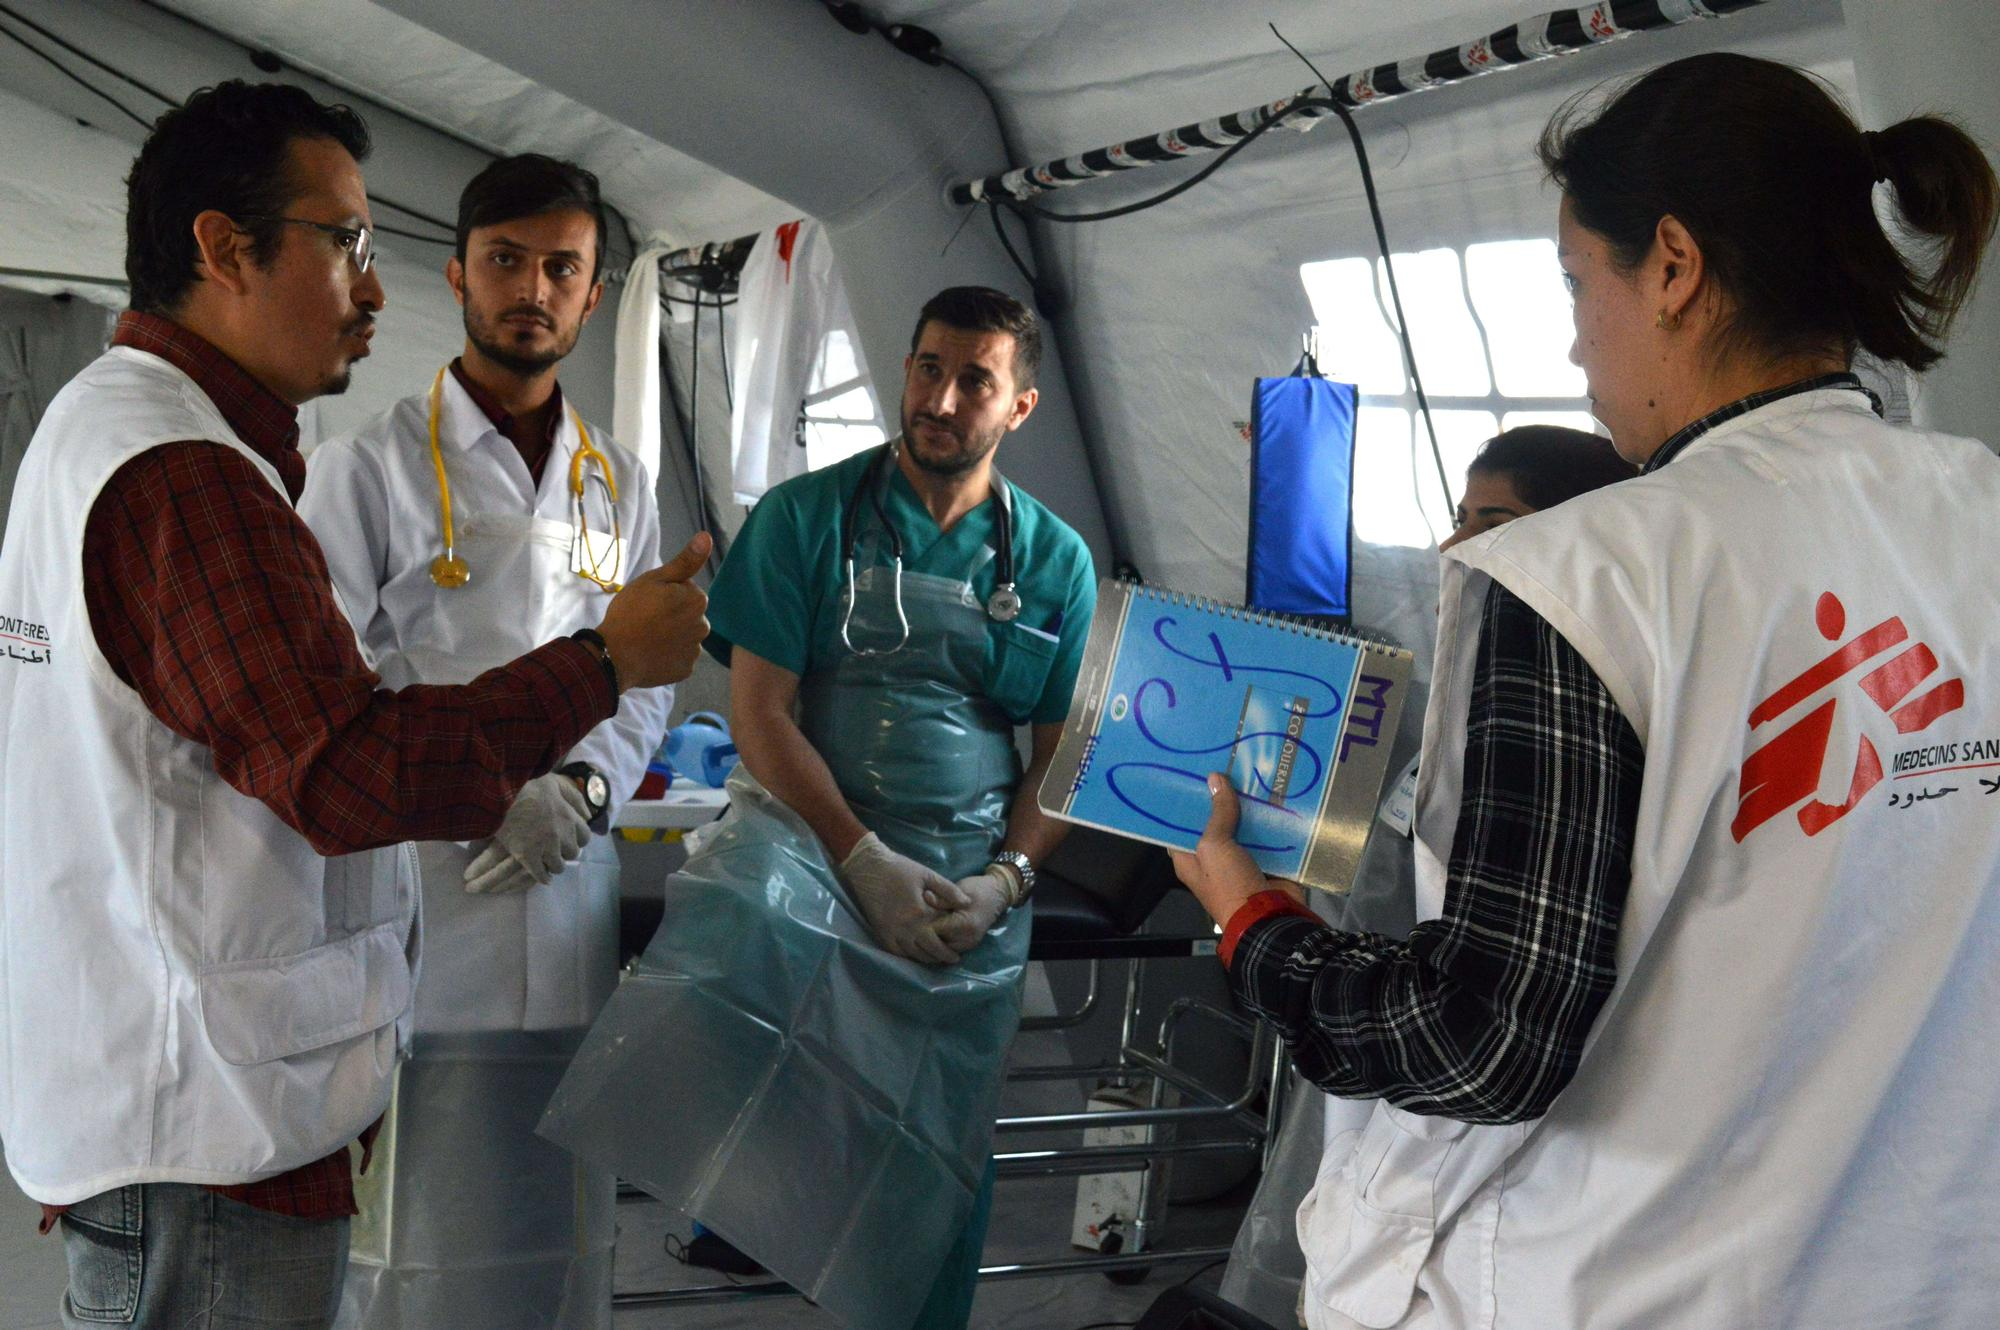 Iraq, Mossul, Surgical Field Hospital